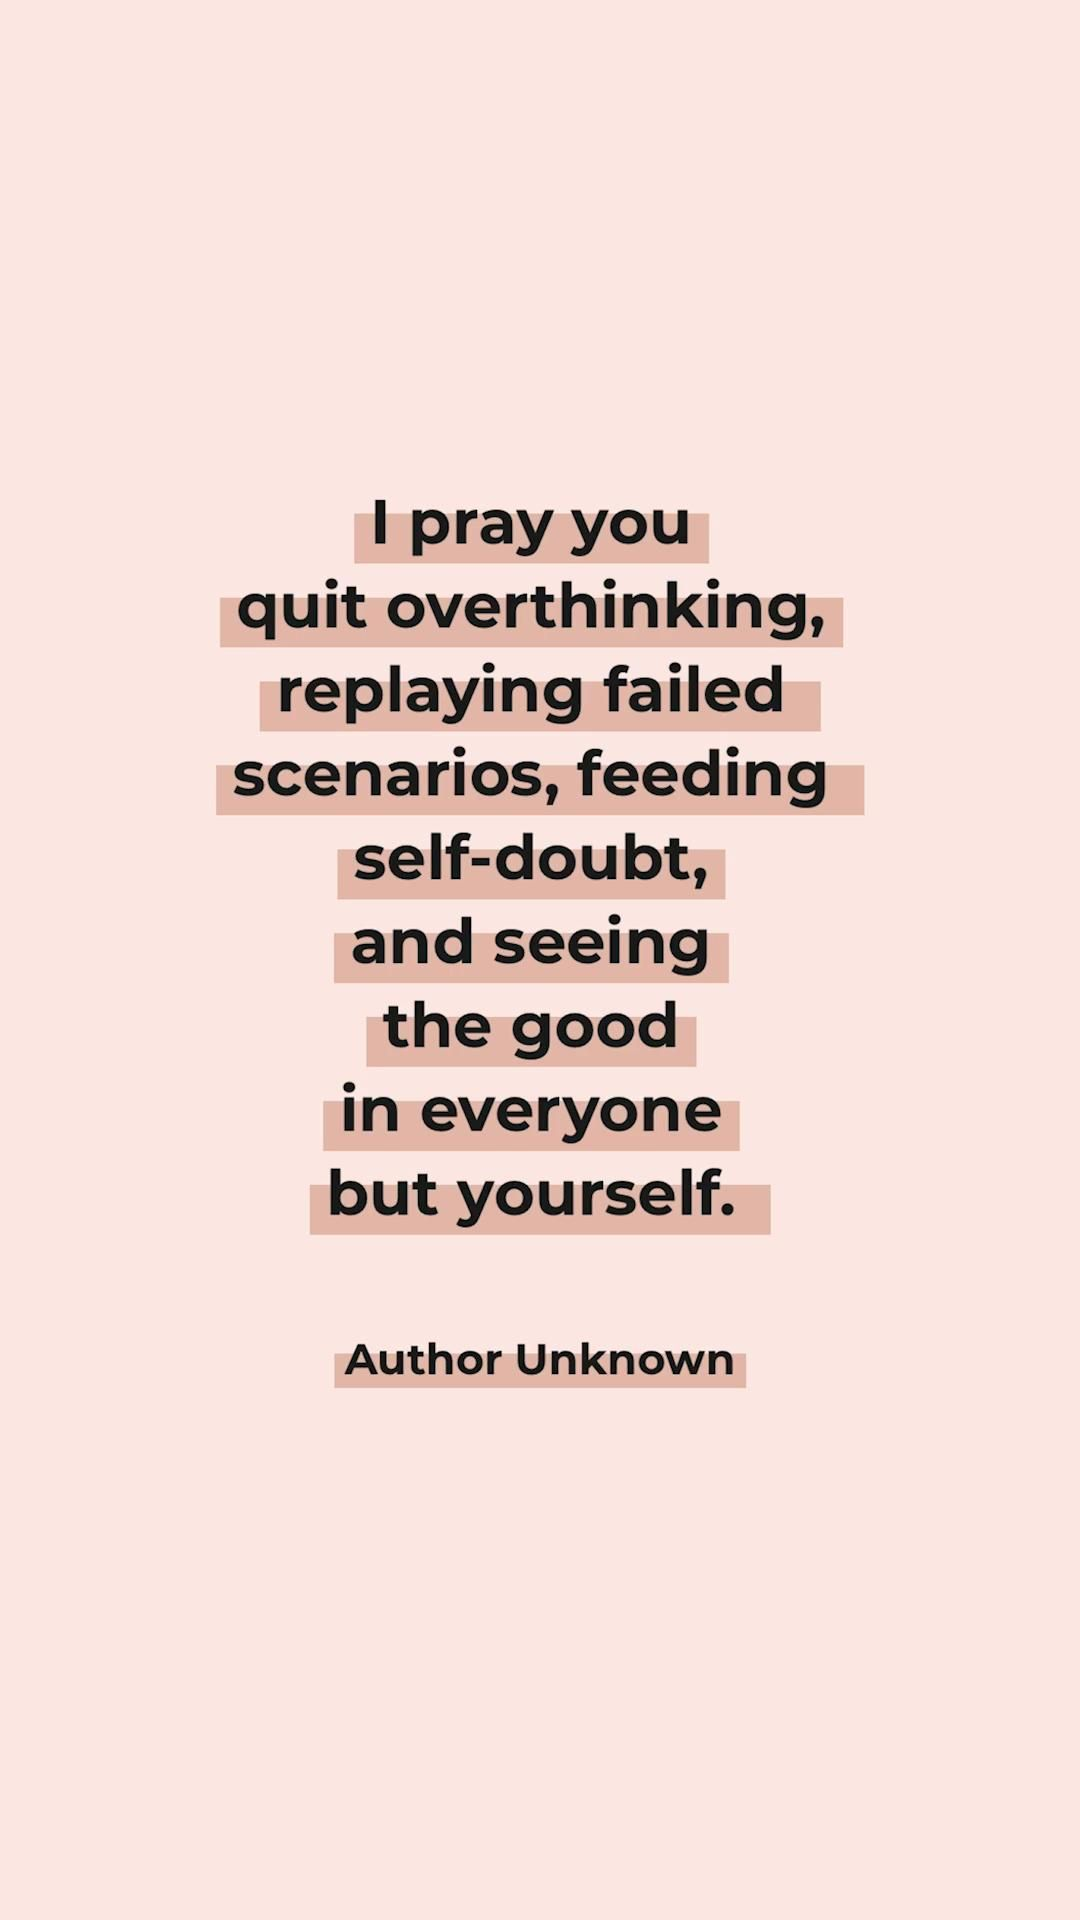 Process your feelings + move forward